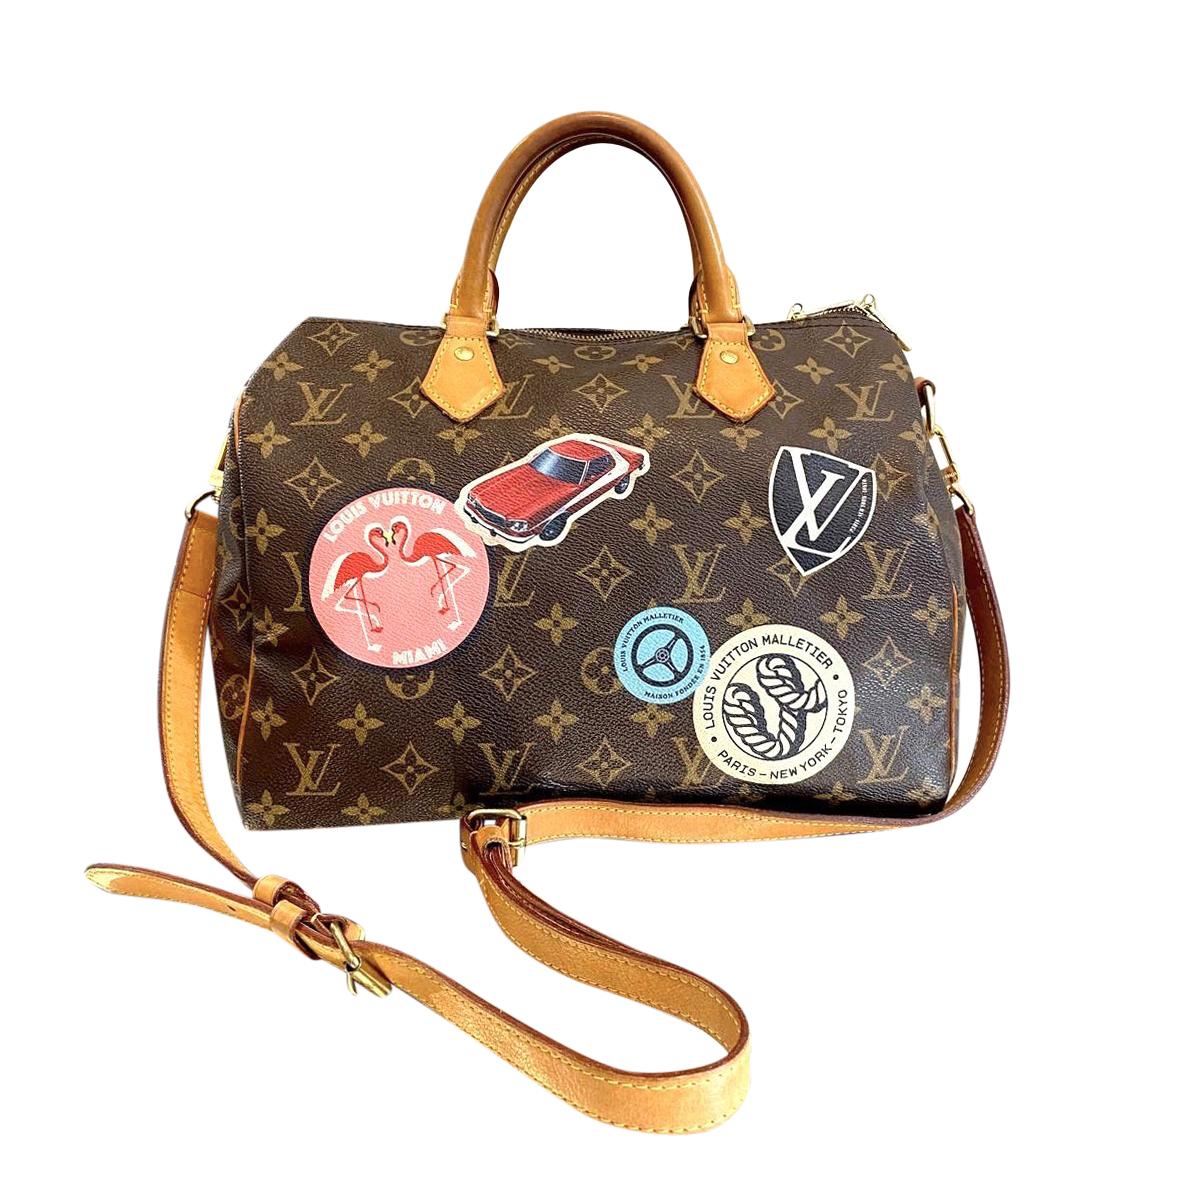 Louis Vuitton Monogram World Tour Speedy 30 Hewi